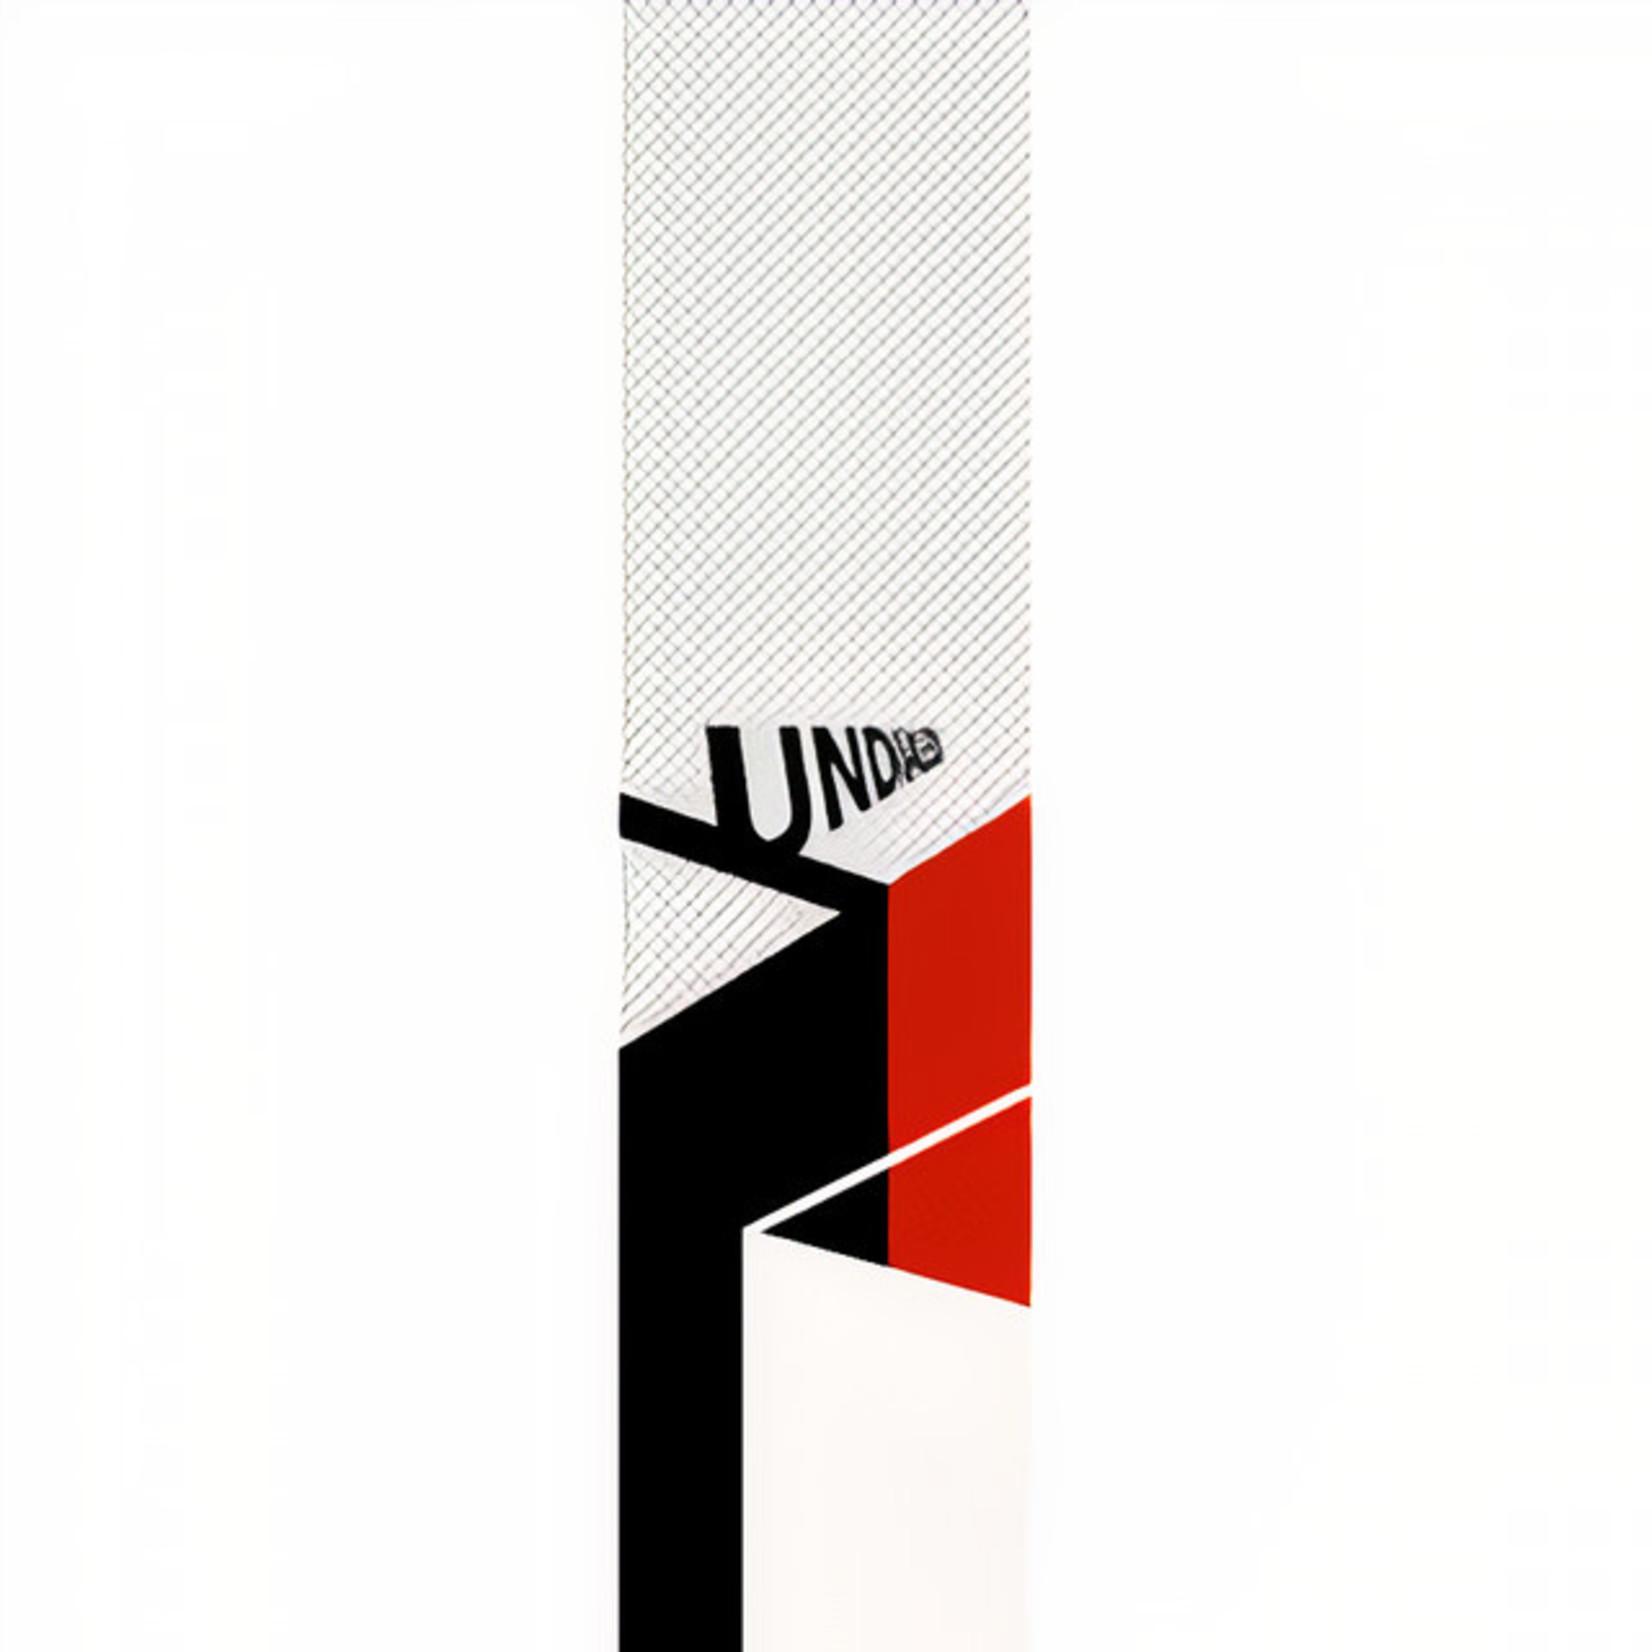 "Undialed Undialed - Grip tape - Edifice 6"" x 24"""